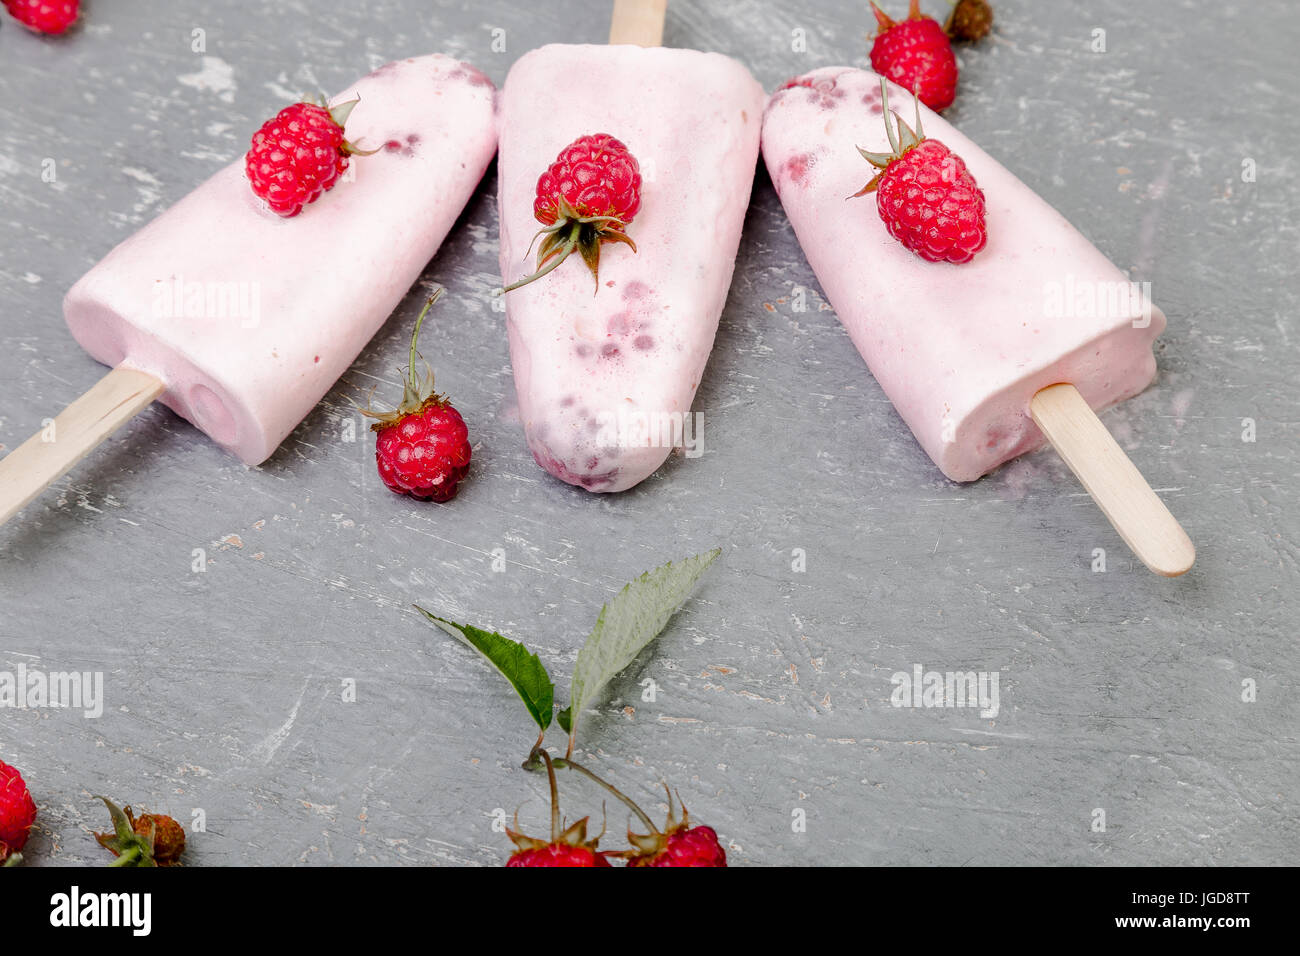 Raspberry ice cream on grey background. Three popsicles. Top view. Homemade Stock Photo